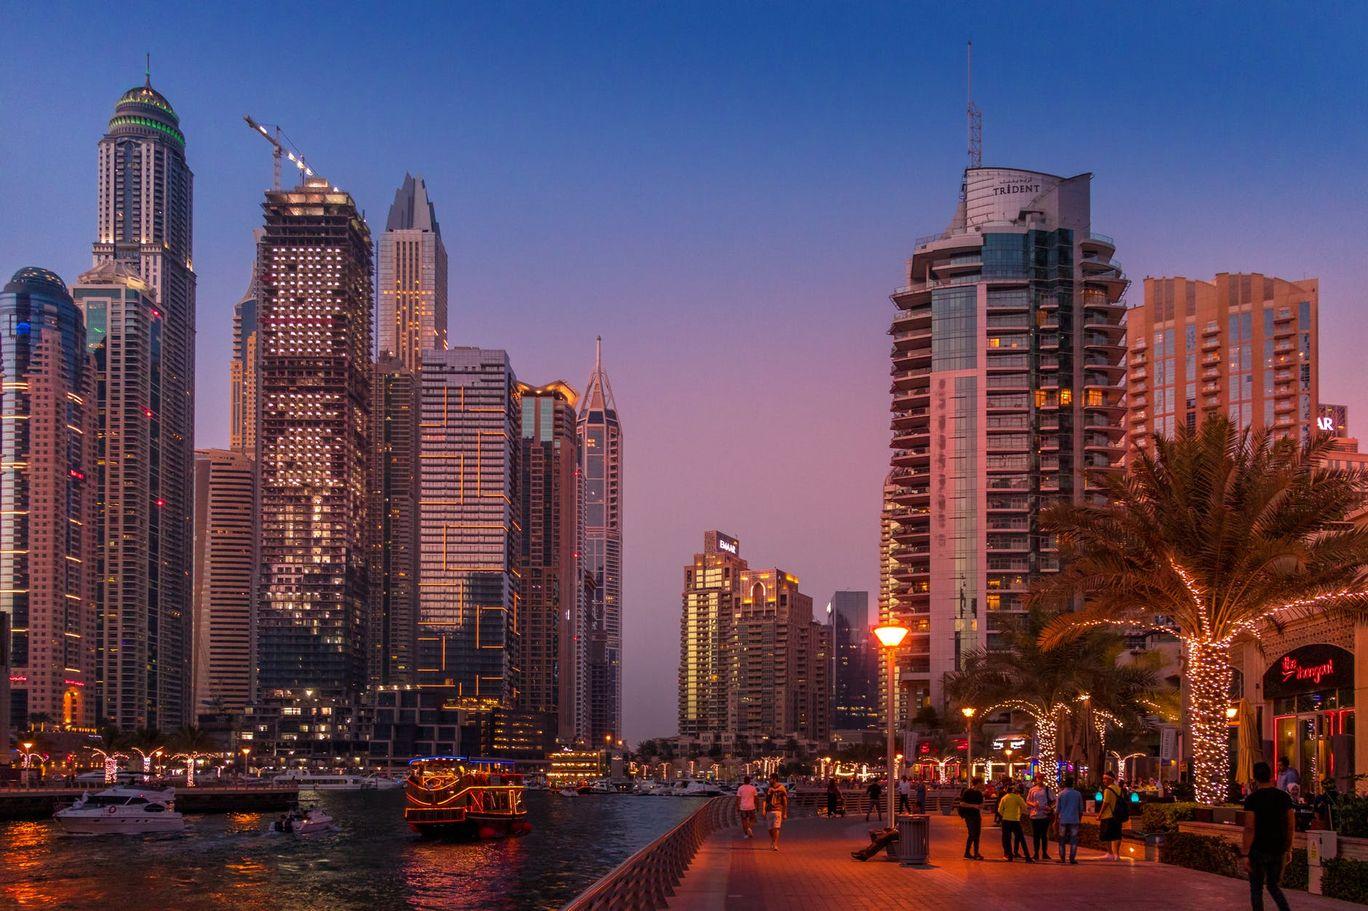 Photo of Dubai By zenith sez